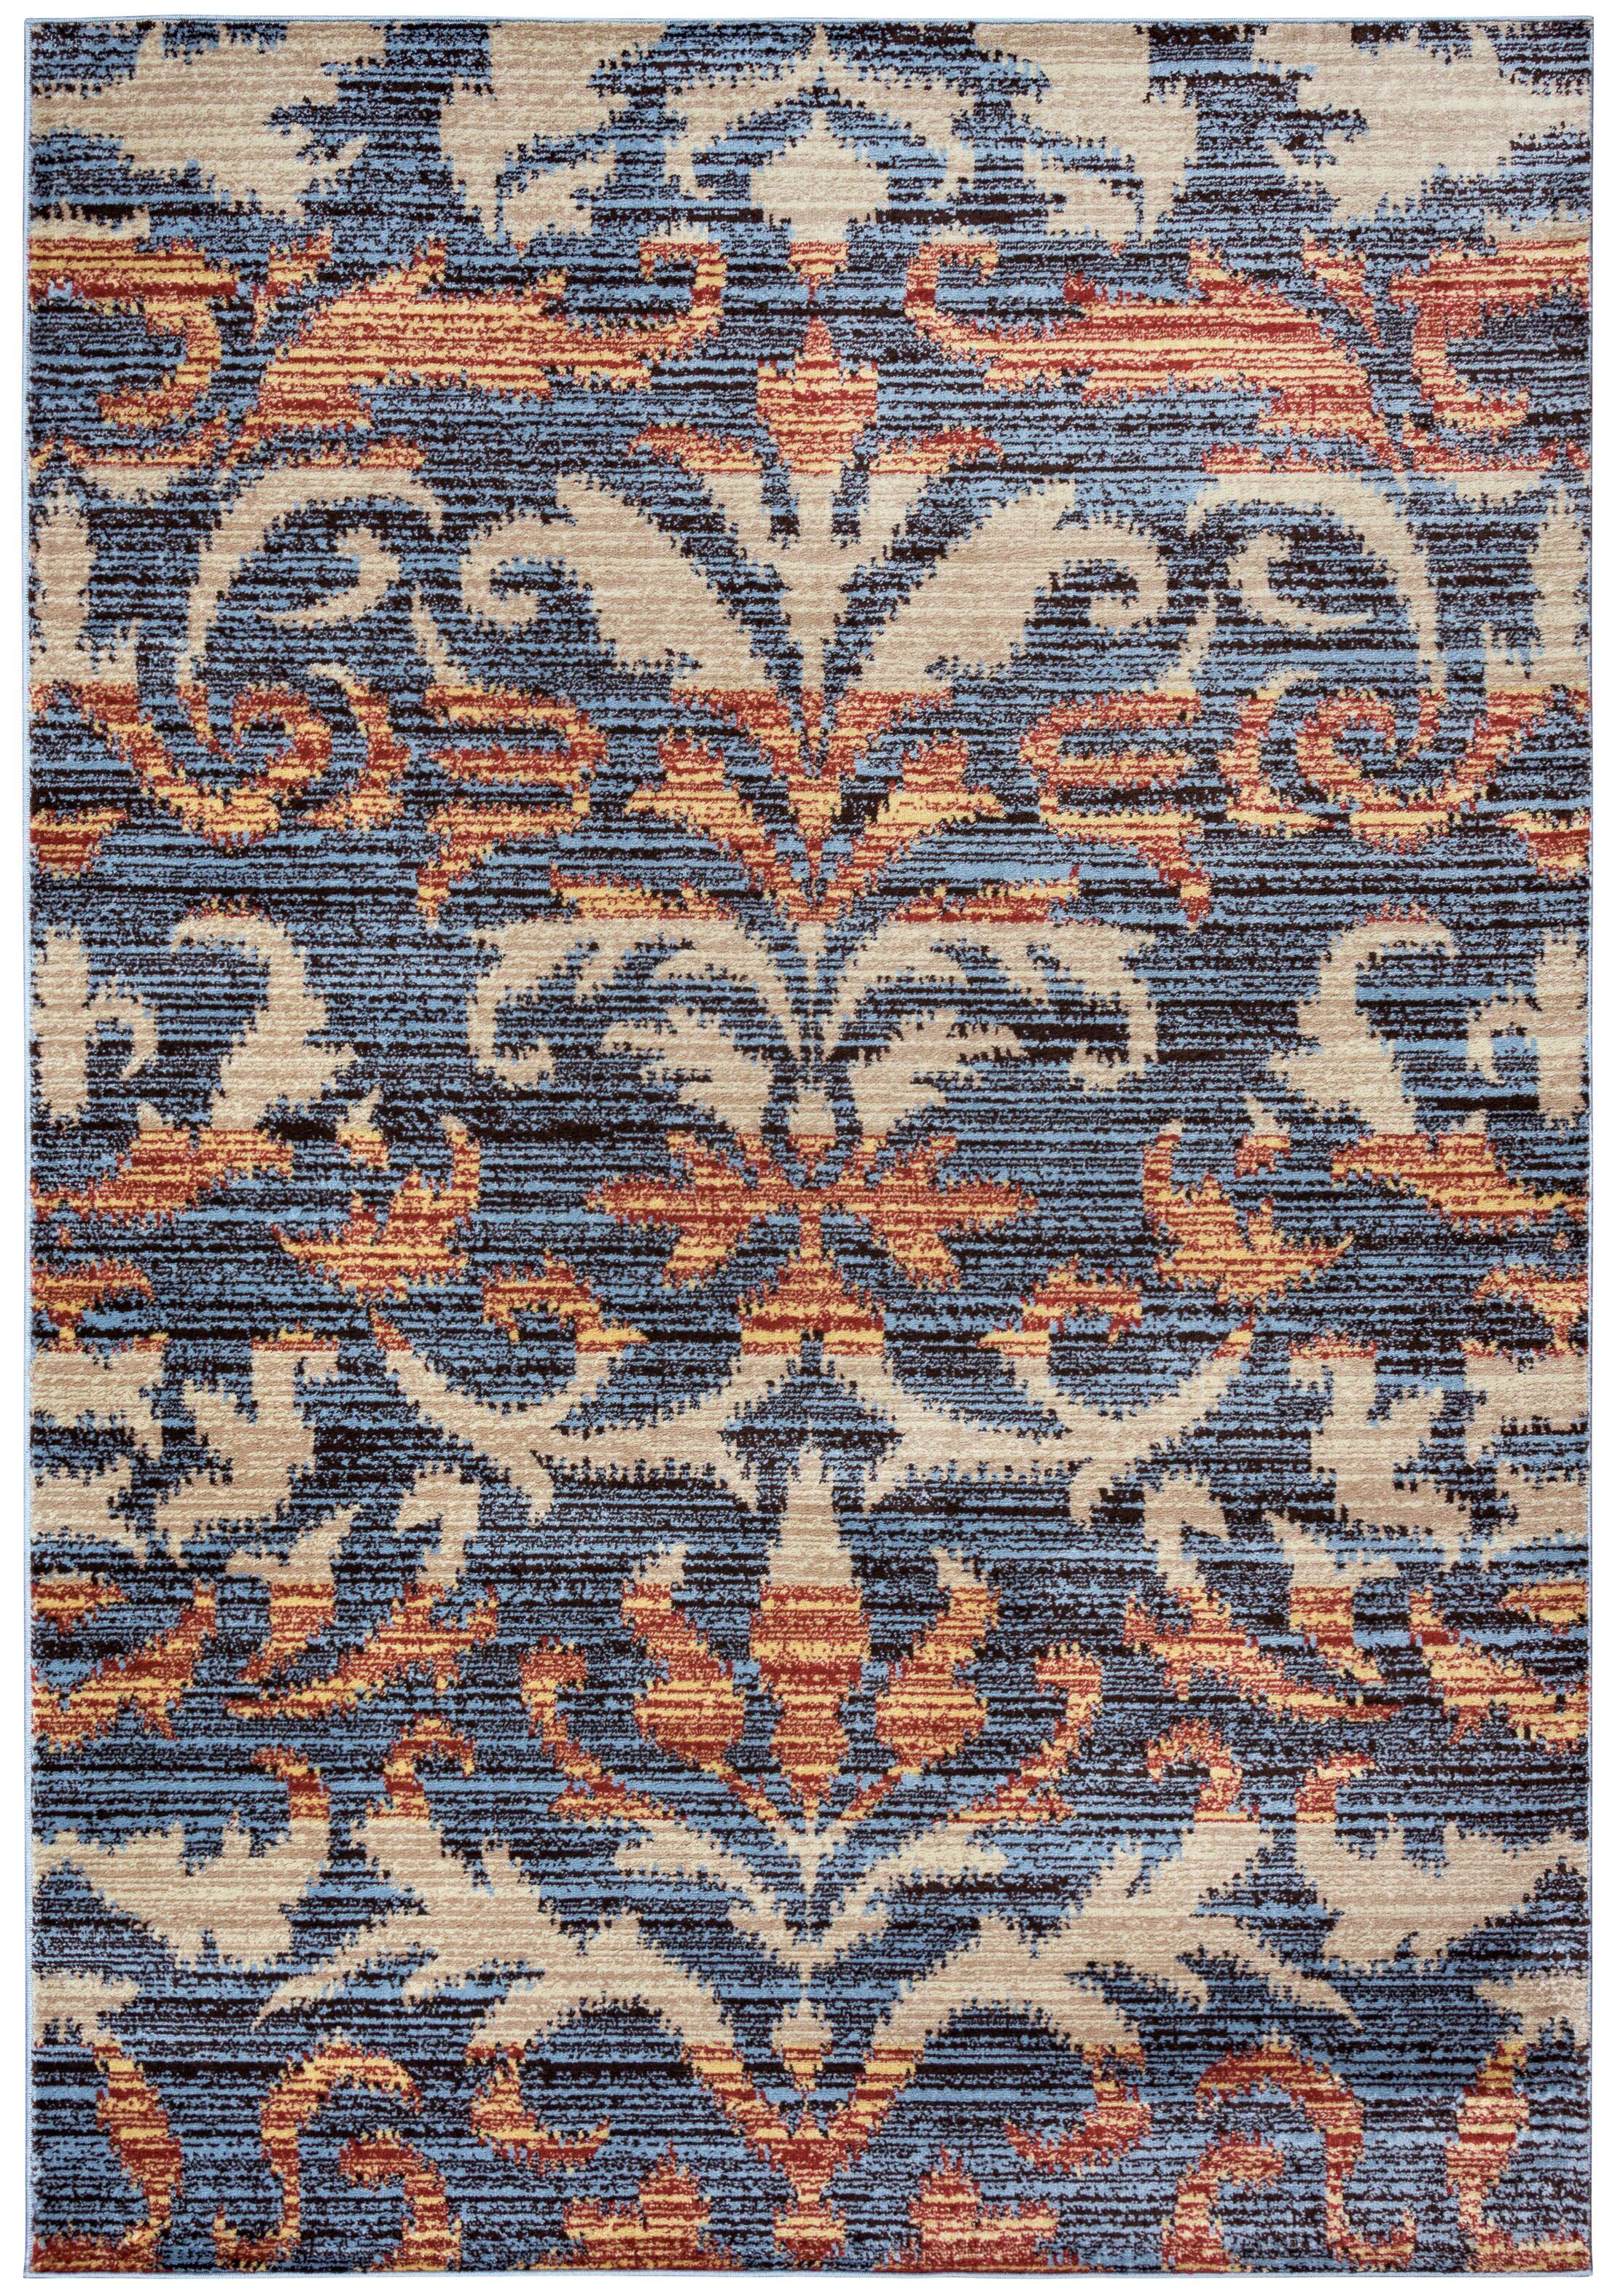 Evangeline Gray Floral/Geometric Area Rug Rug Size: Rectangle 9'2